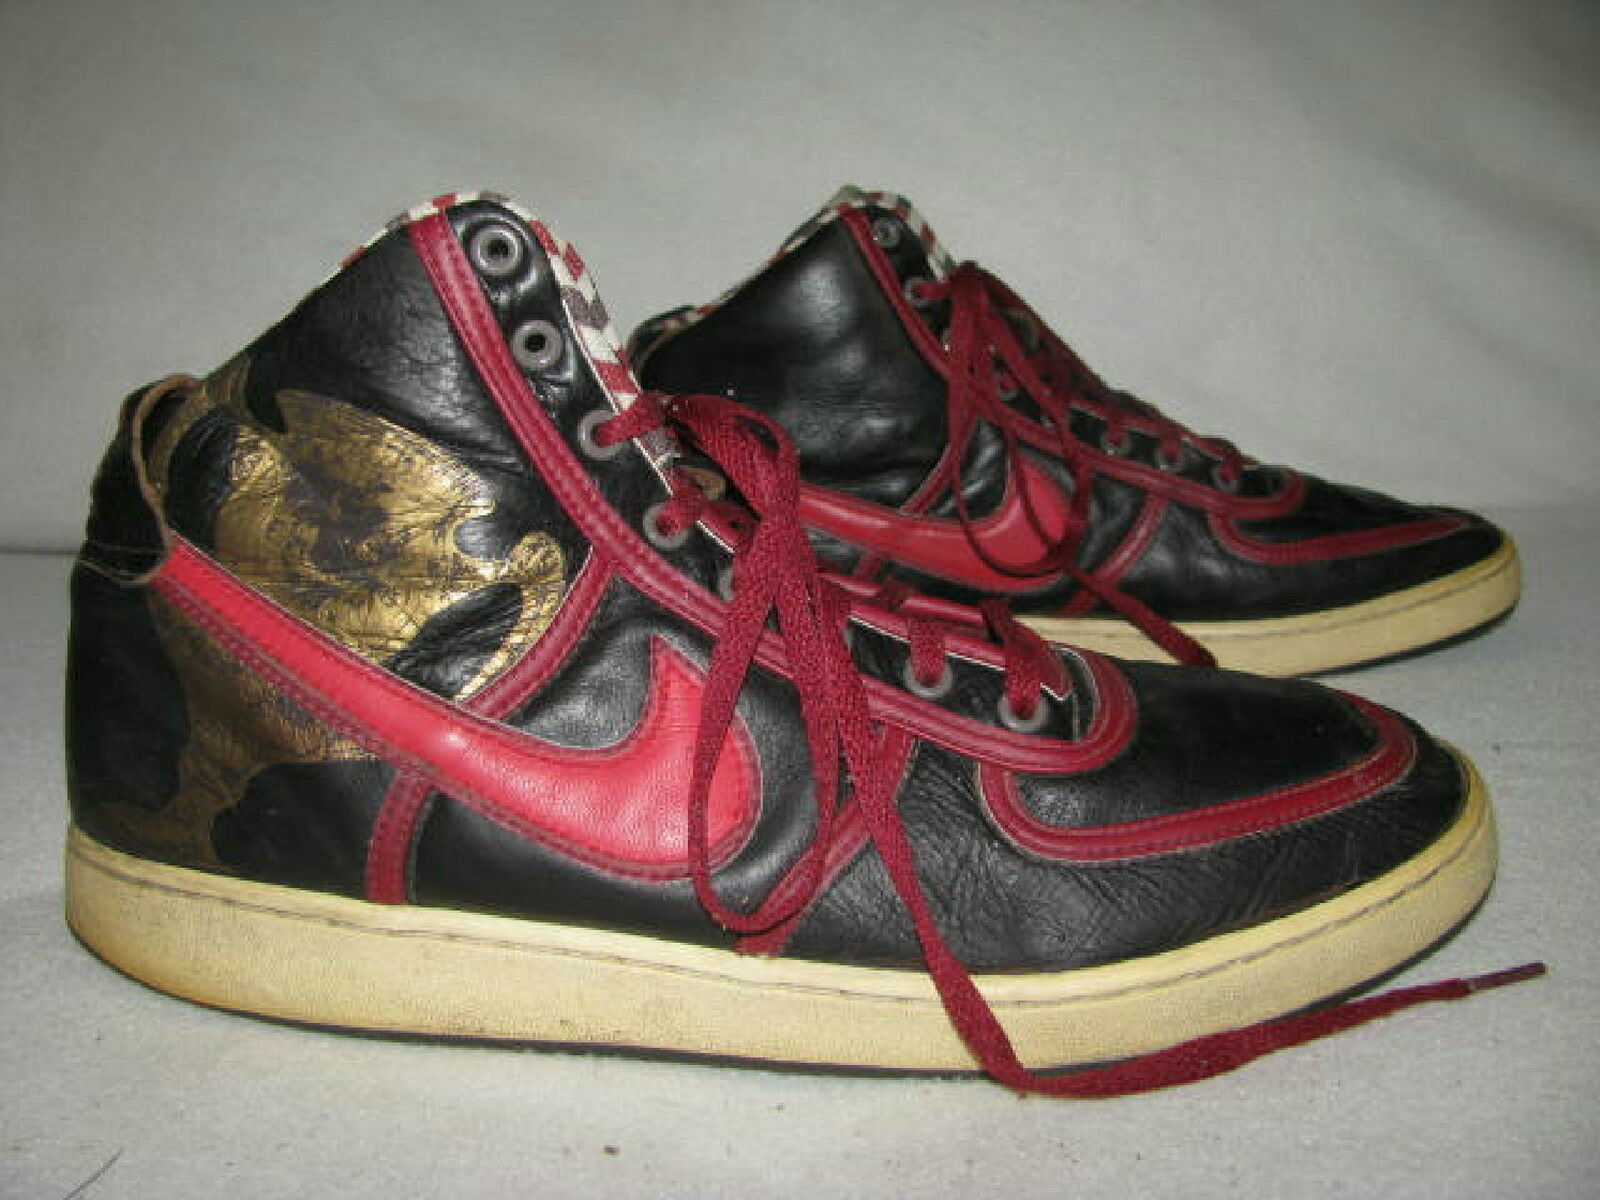 NIKE Vandal High Red Premium Sneakers Sz 13 Red High Black 315060-261 Black Fives Edition 1d1dc7